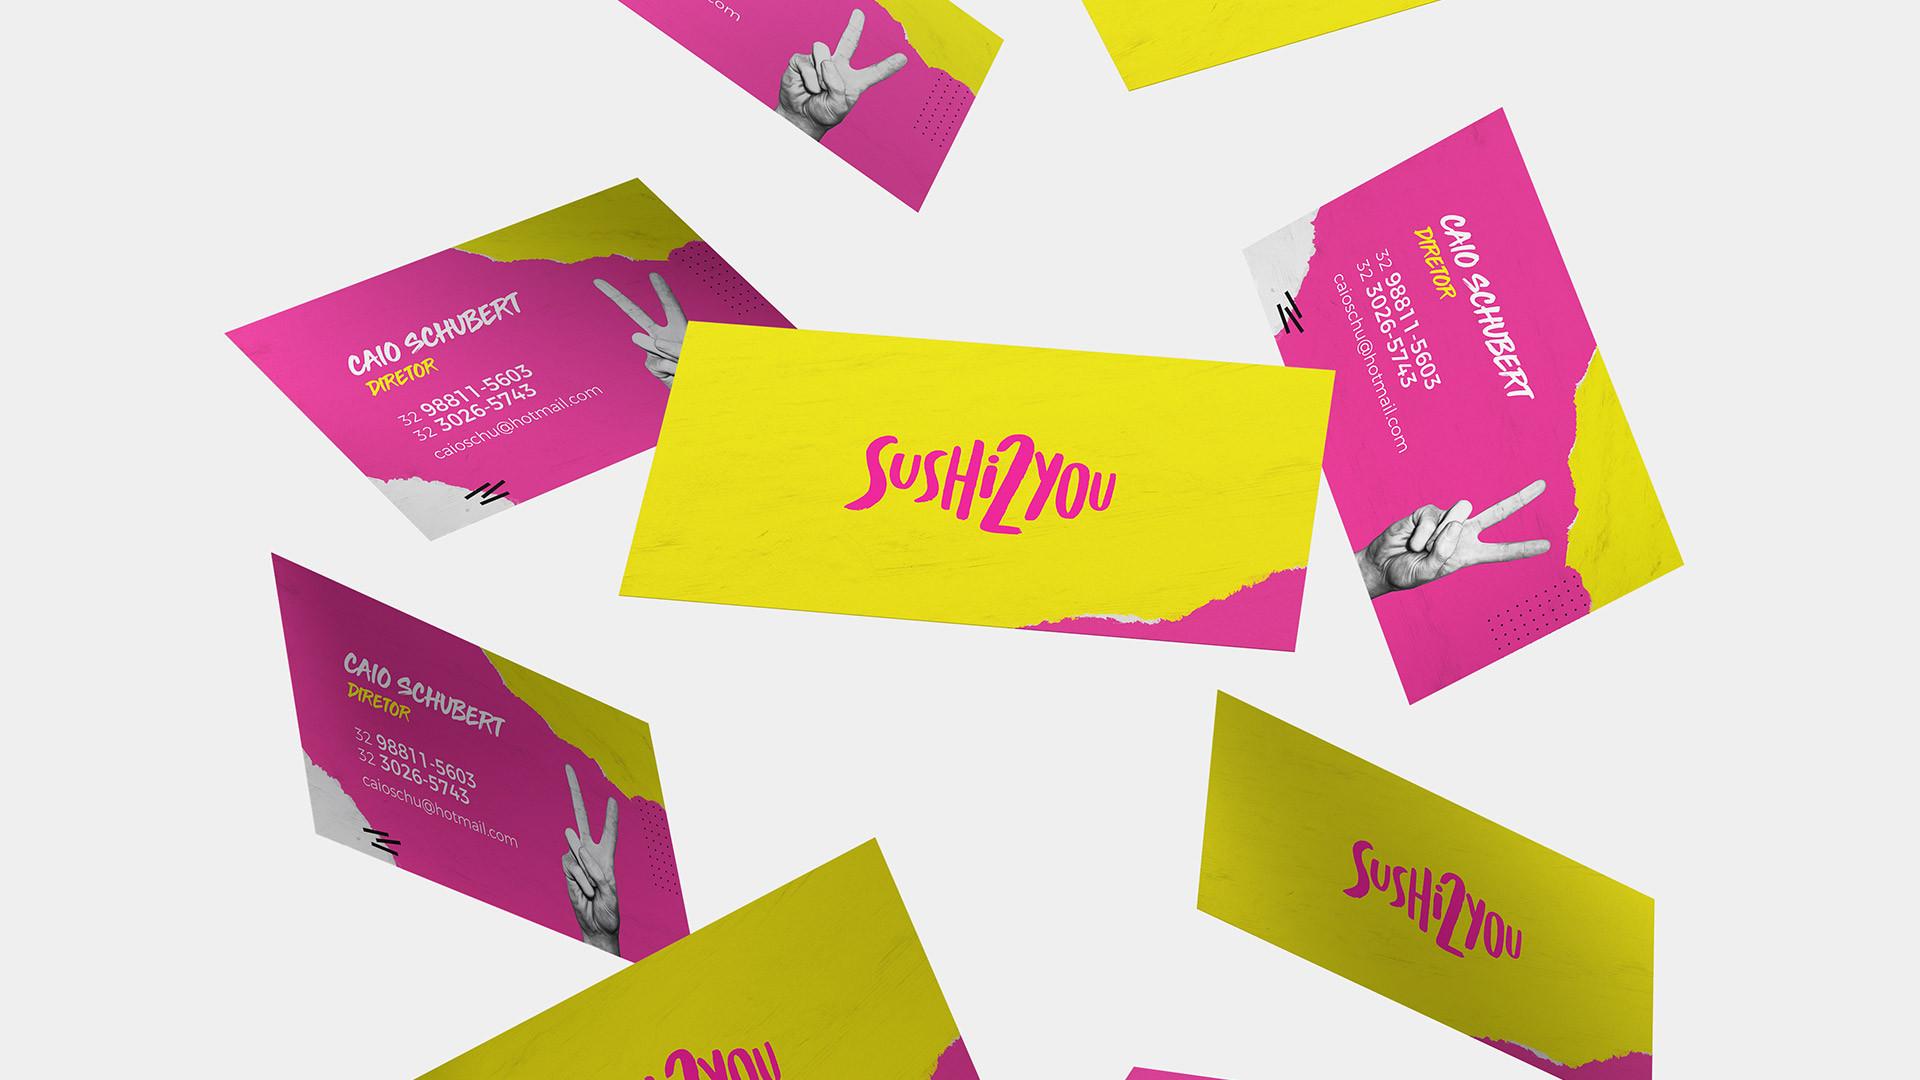 Sushi 2 You - Identidade Visual Branding